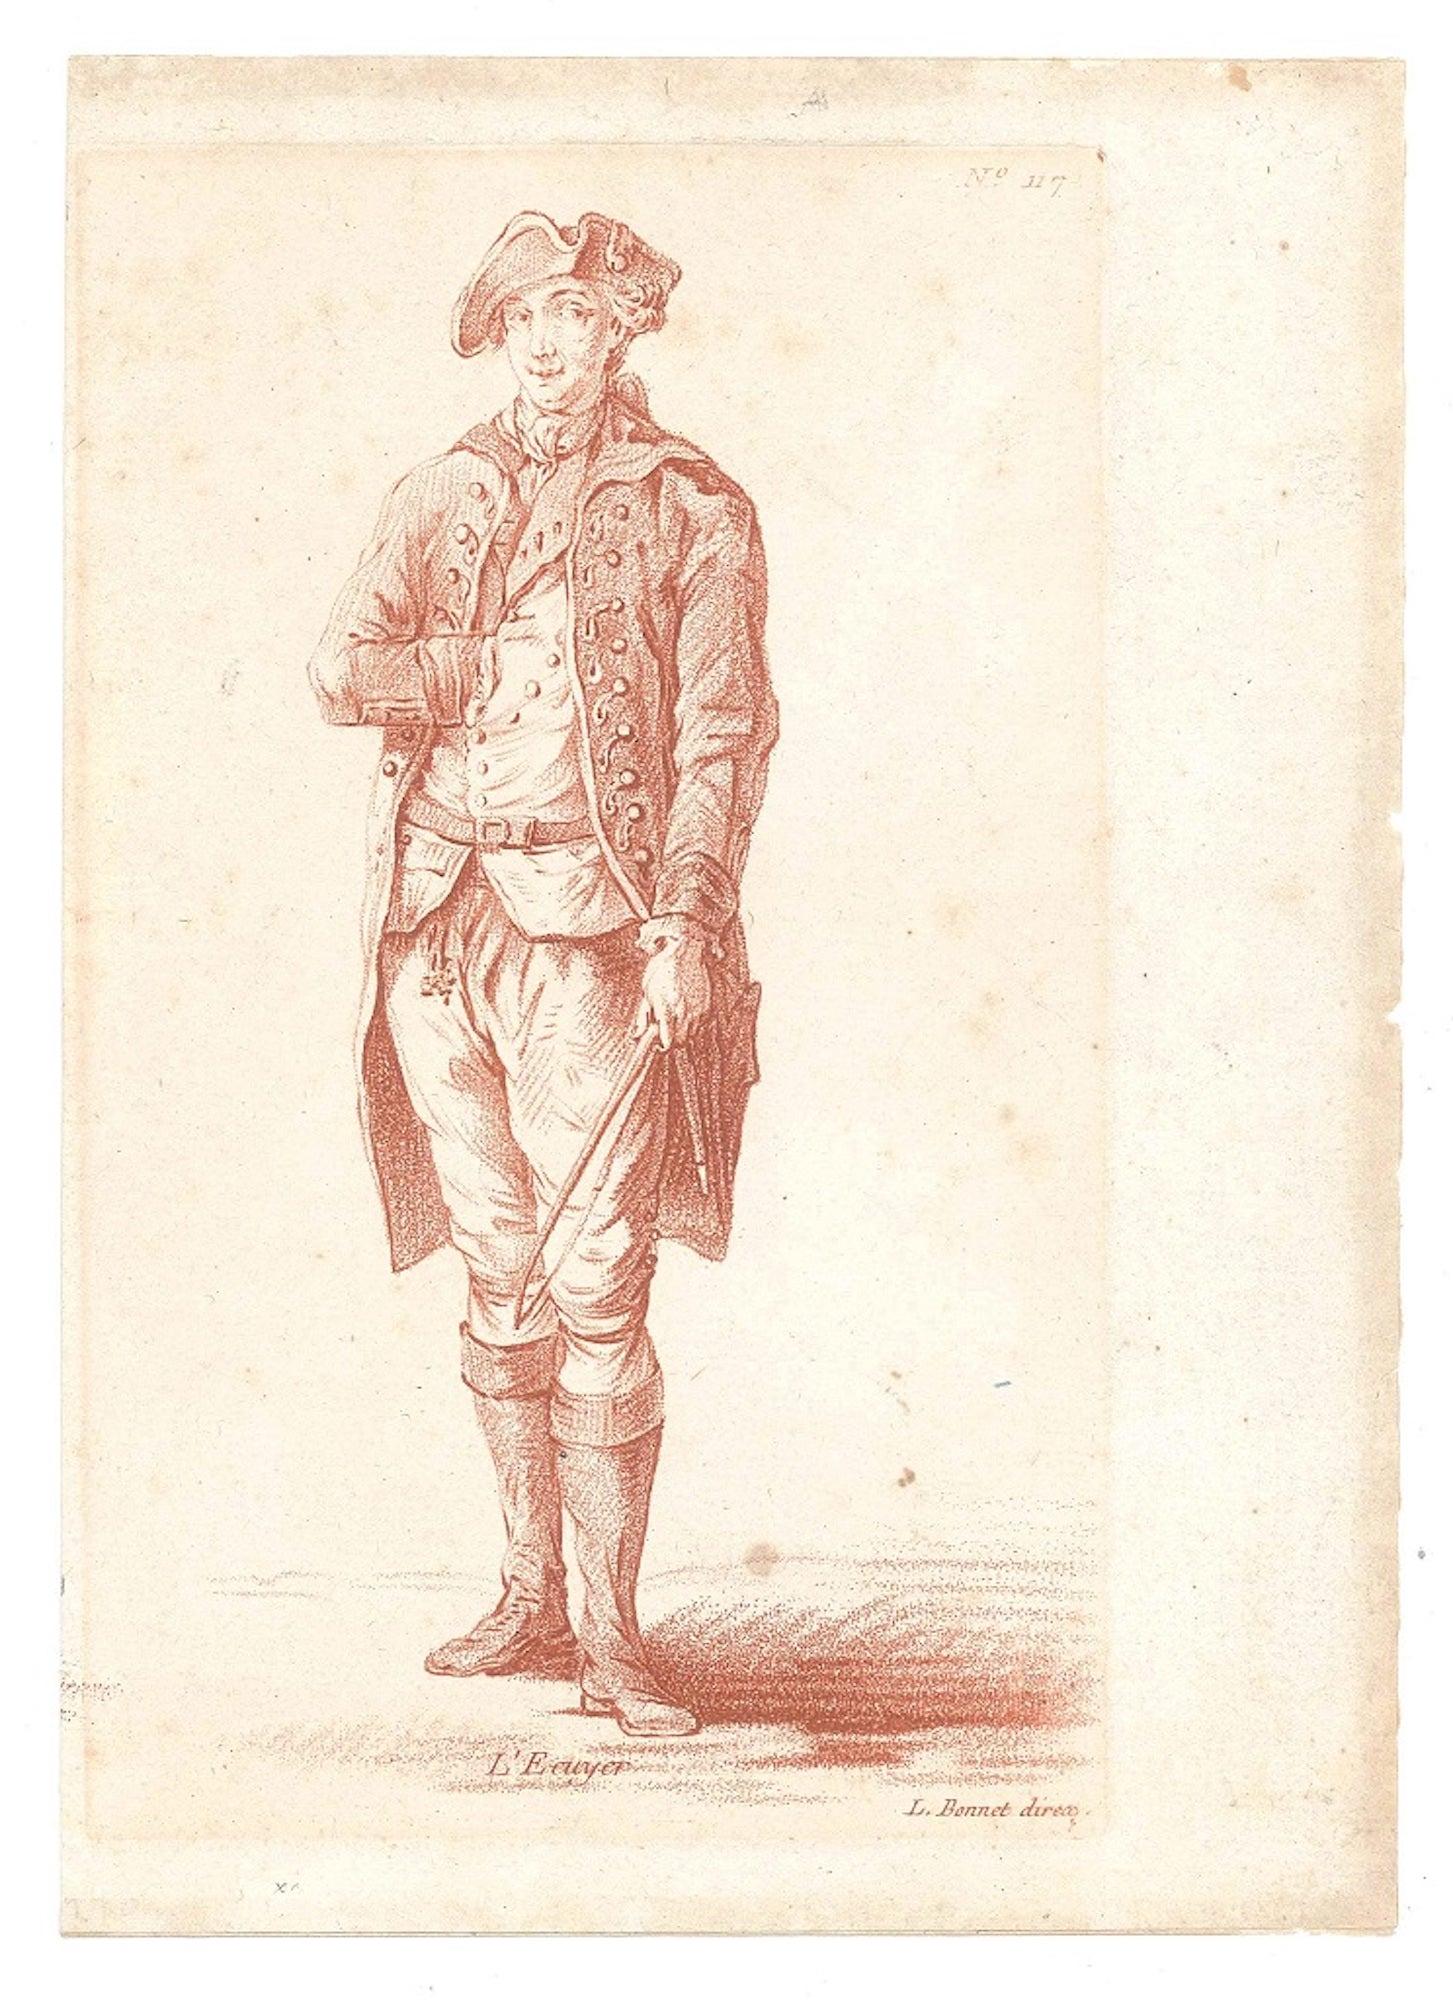 L'Ecuyer - Original Etching and Pastel by L-M Bonnet - Late 18th Century